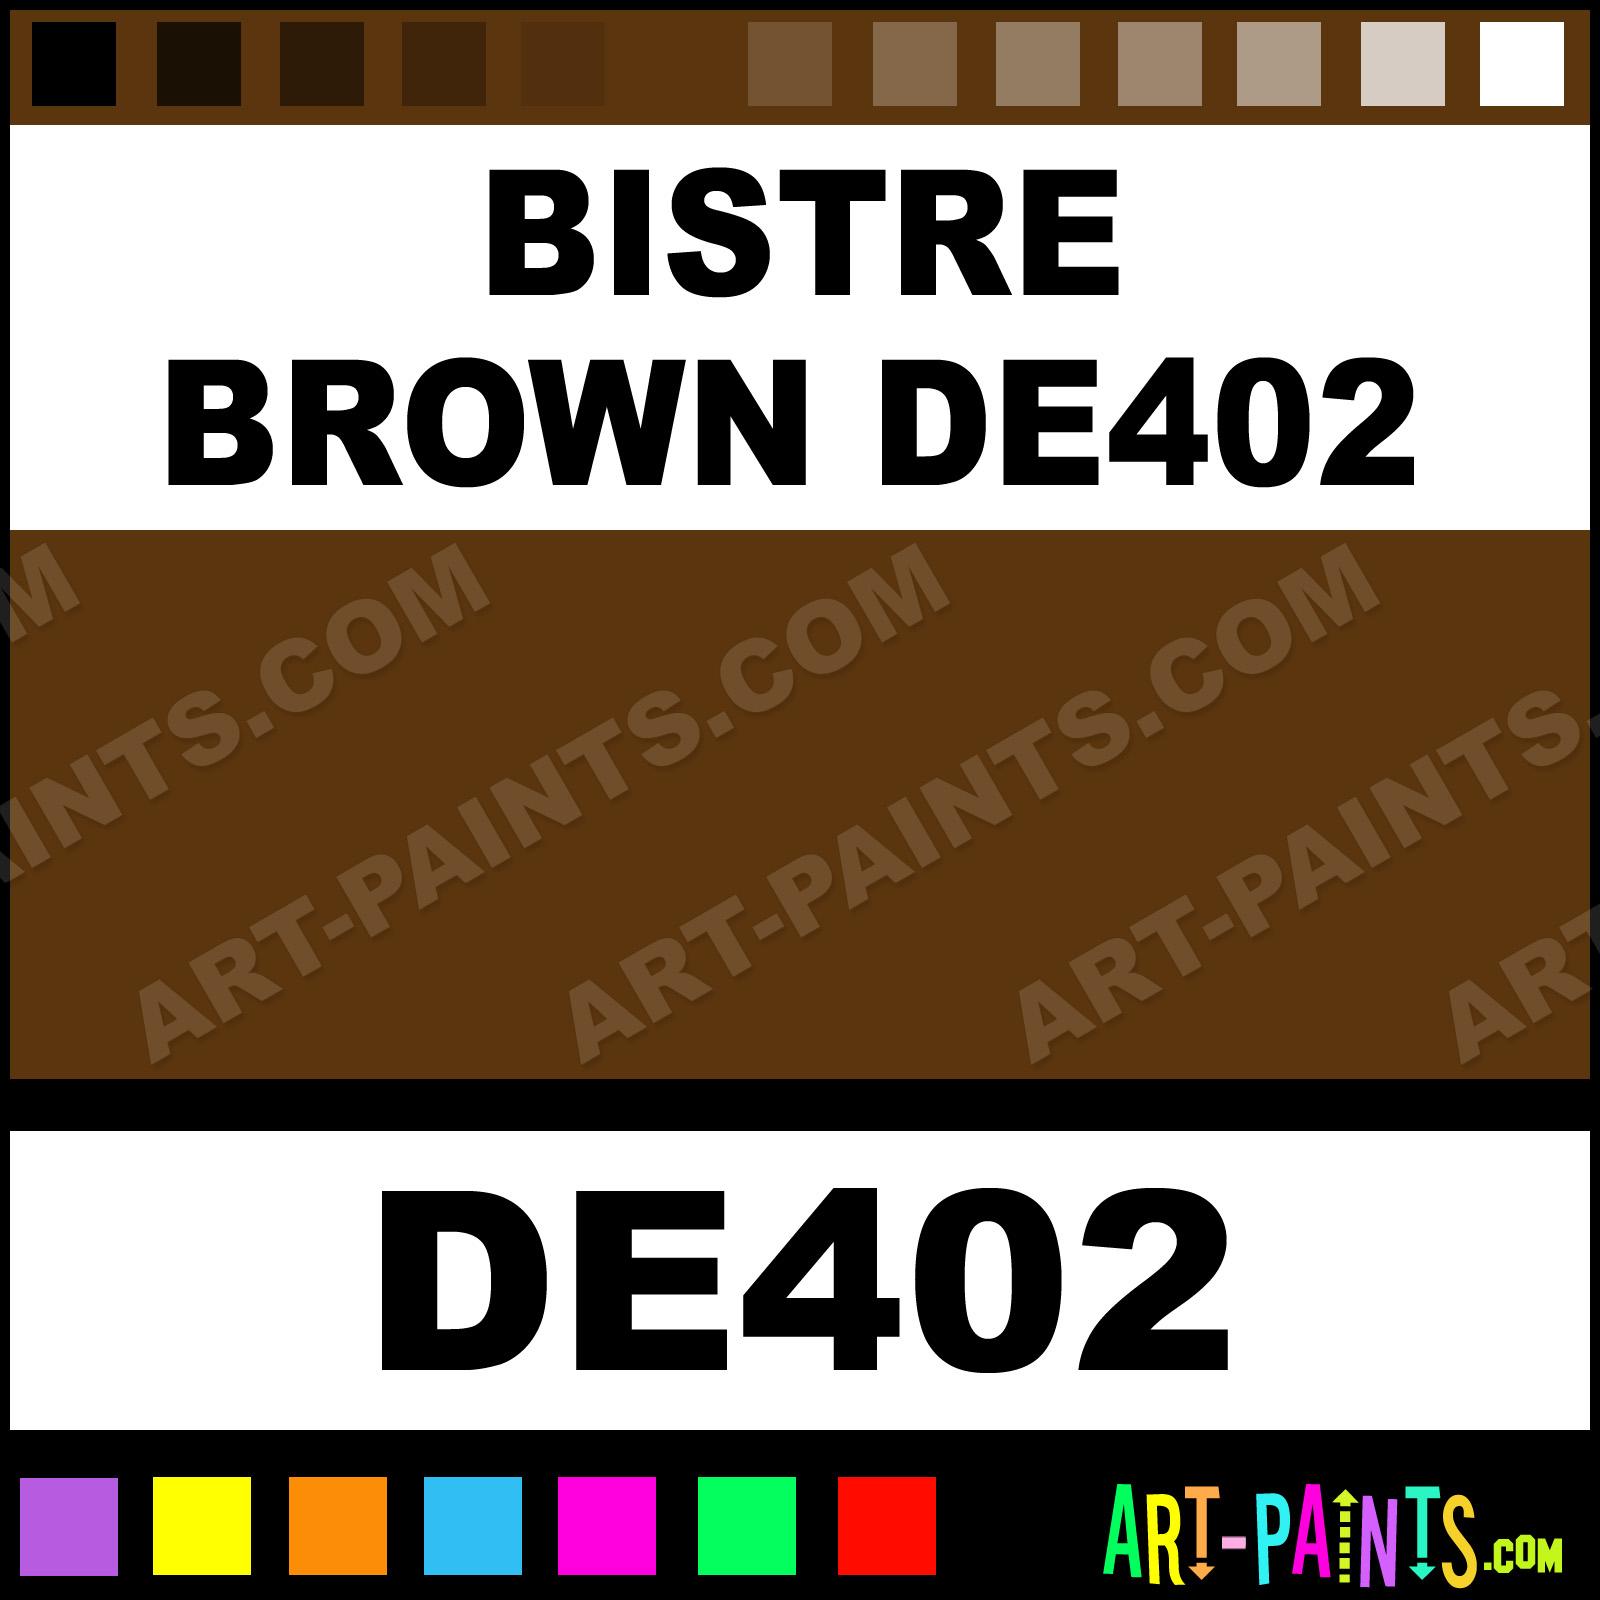 Bistre Brown Color - 0425